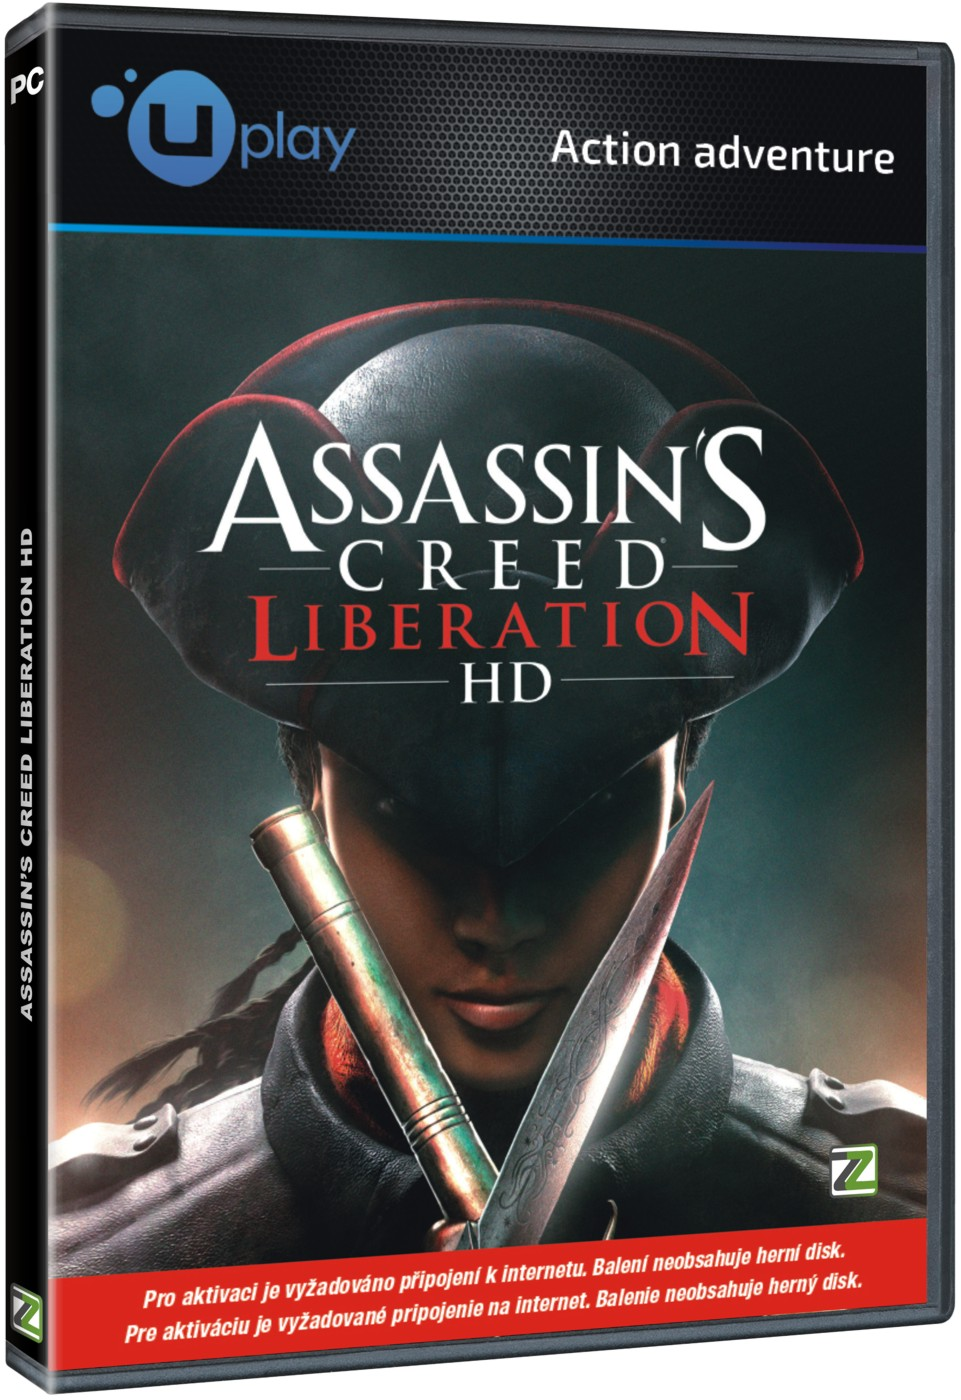 ASSASSINS CREED LIBERATION HD - PC (Code Uplay)